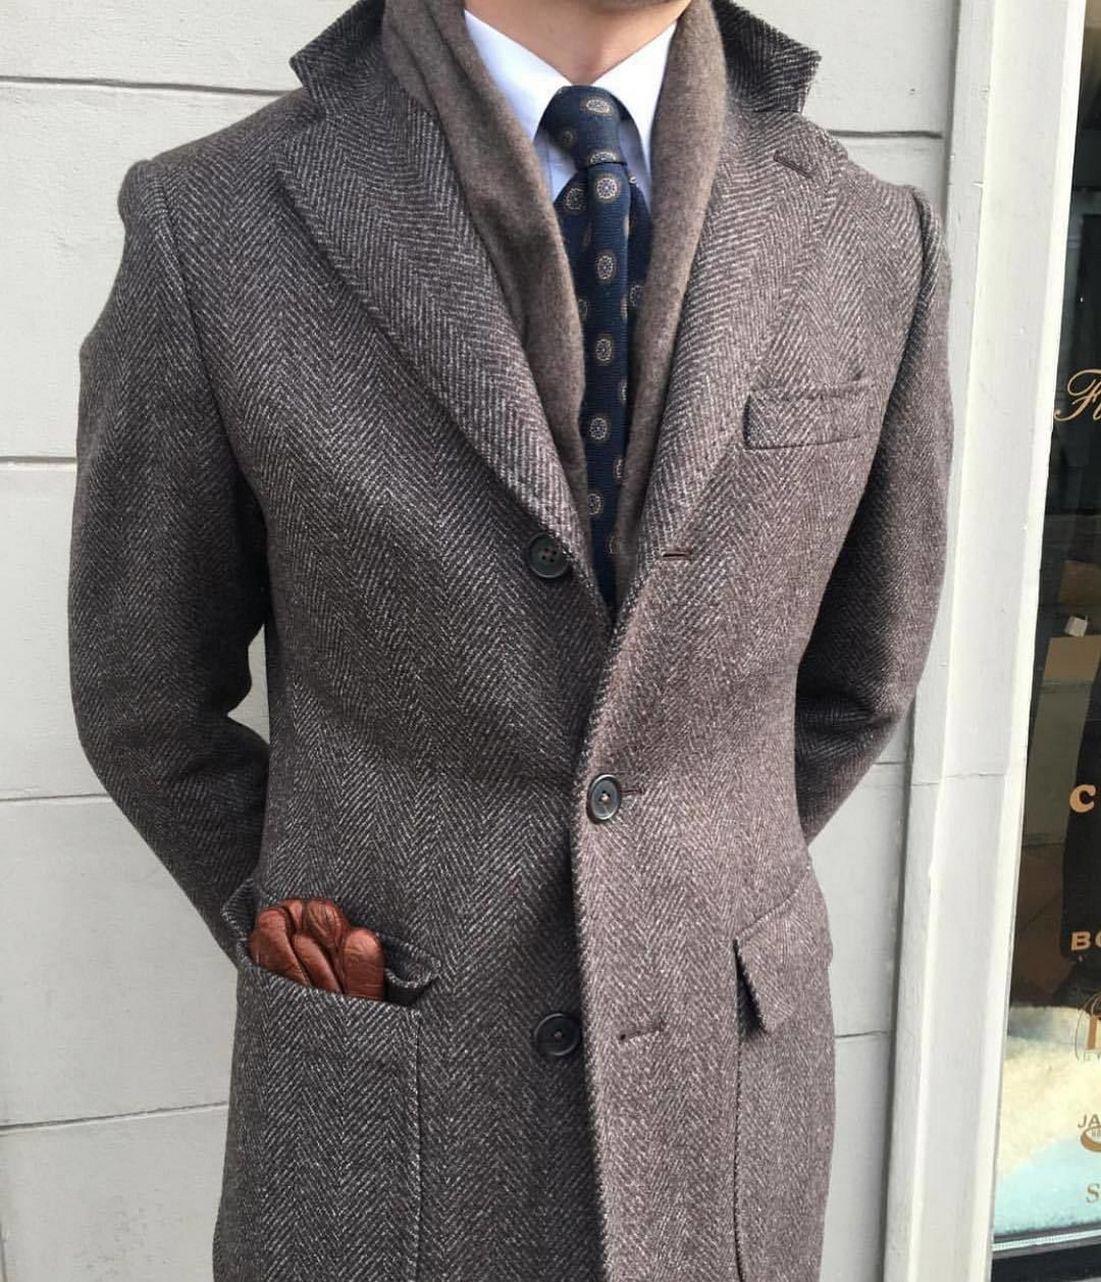 50+ Awesome Outfit Mens Fashion Classic Ideas | manlikemarvinsparks.com #mensfashion